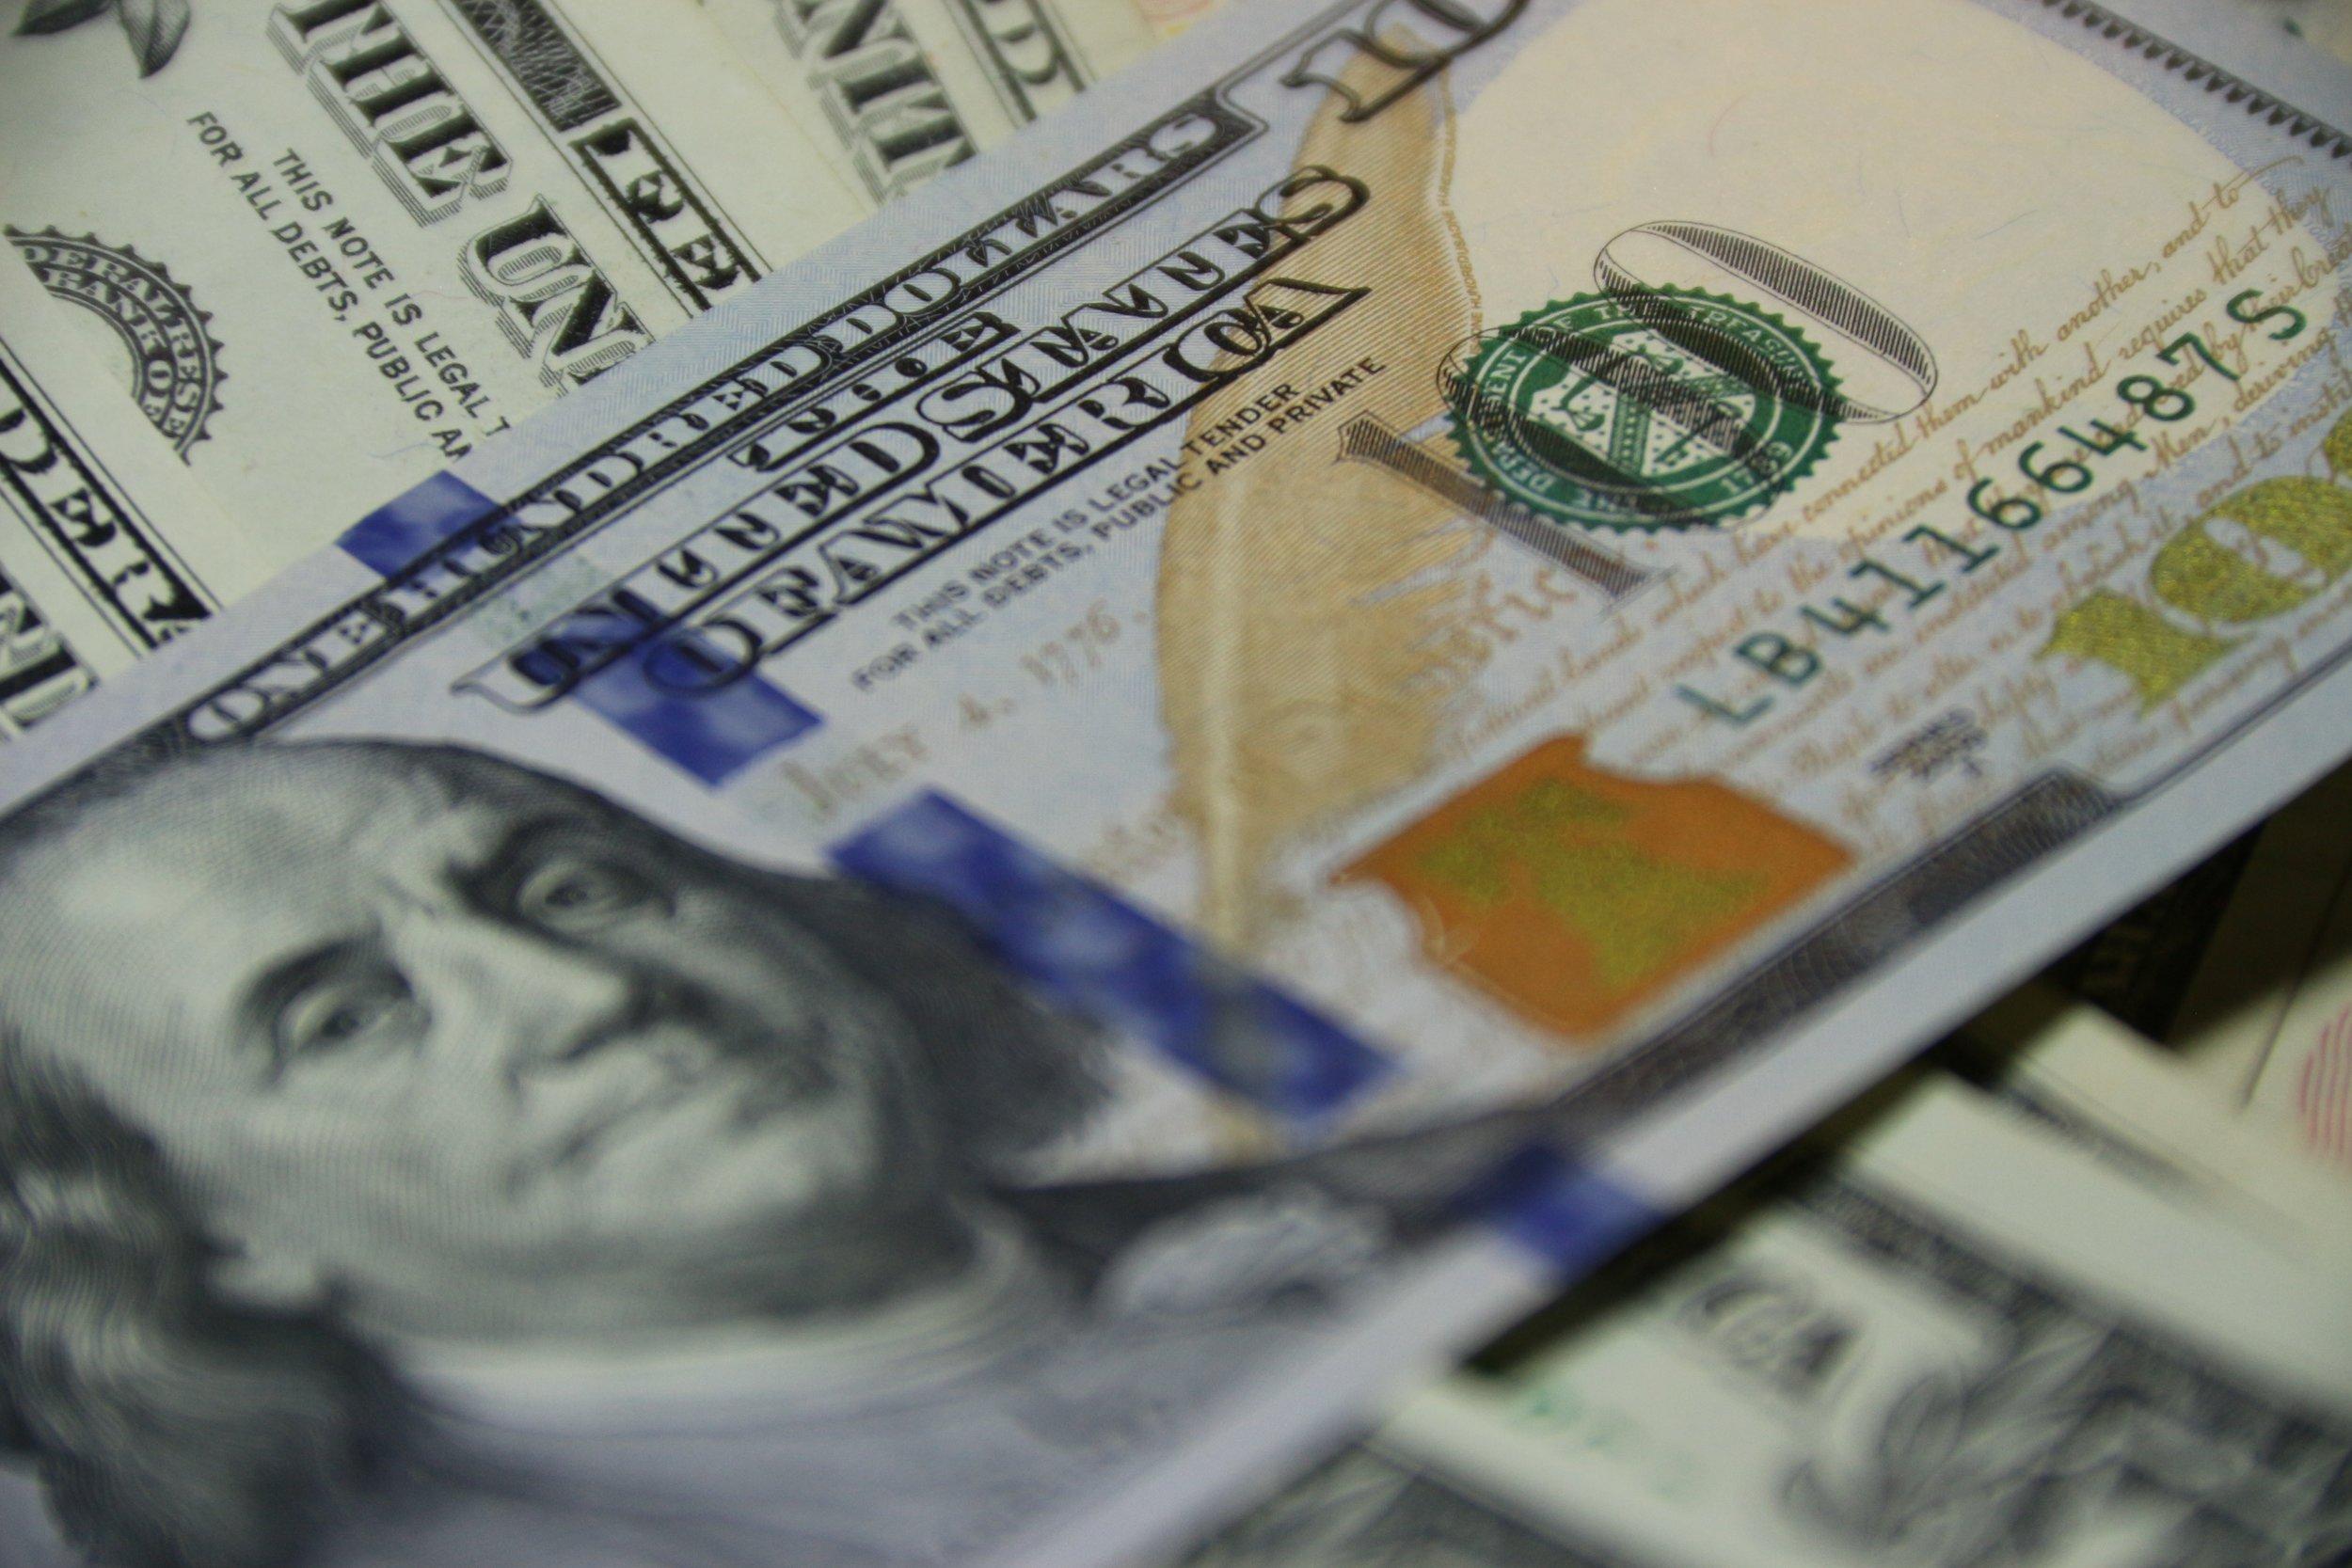 moneymanagement-healthyandwellness-financialadvice-financialfuture.jpg